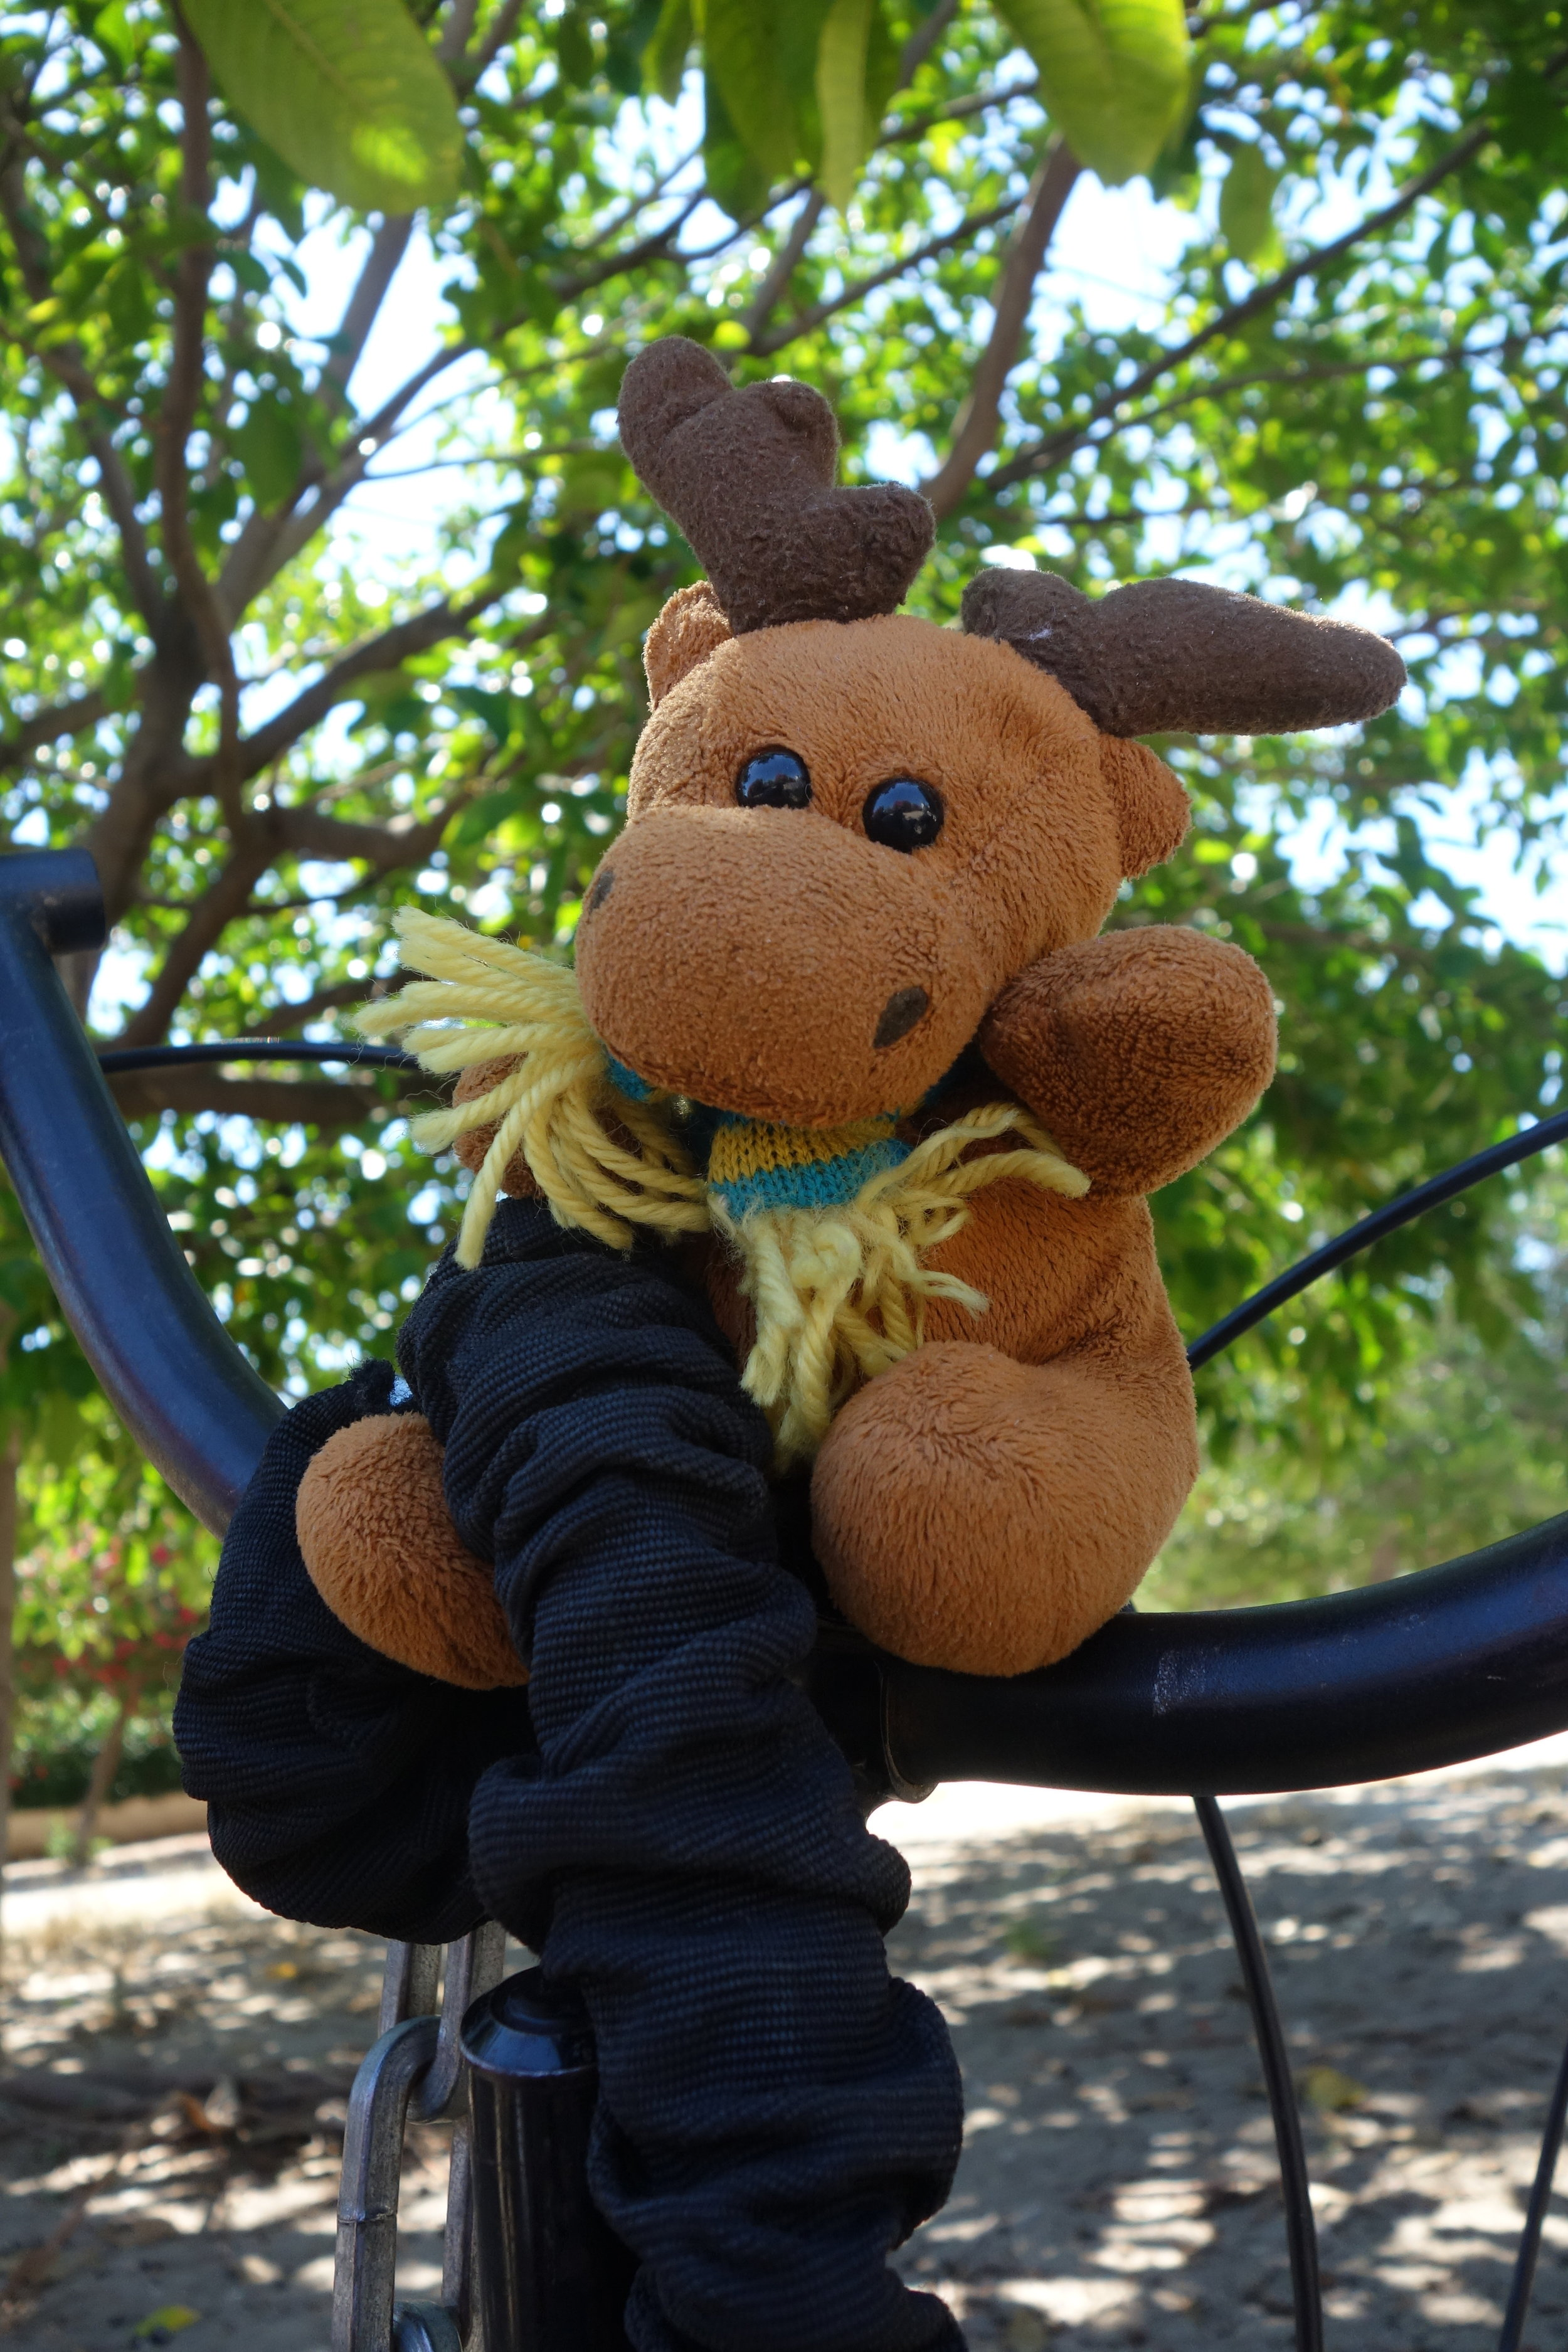 Our Swedish Kids Moose 'Sven' brings luck.